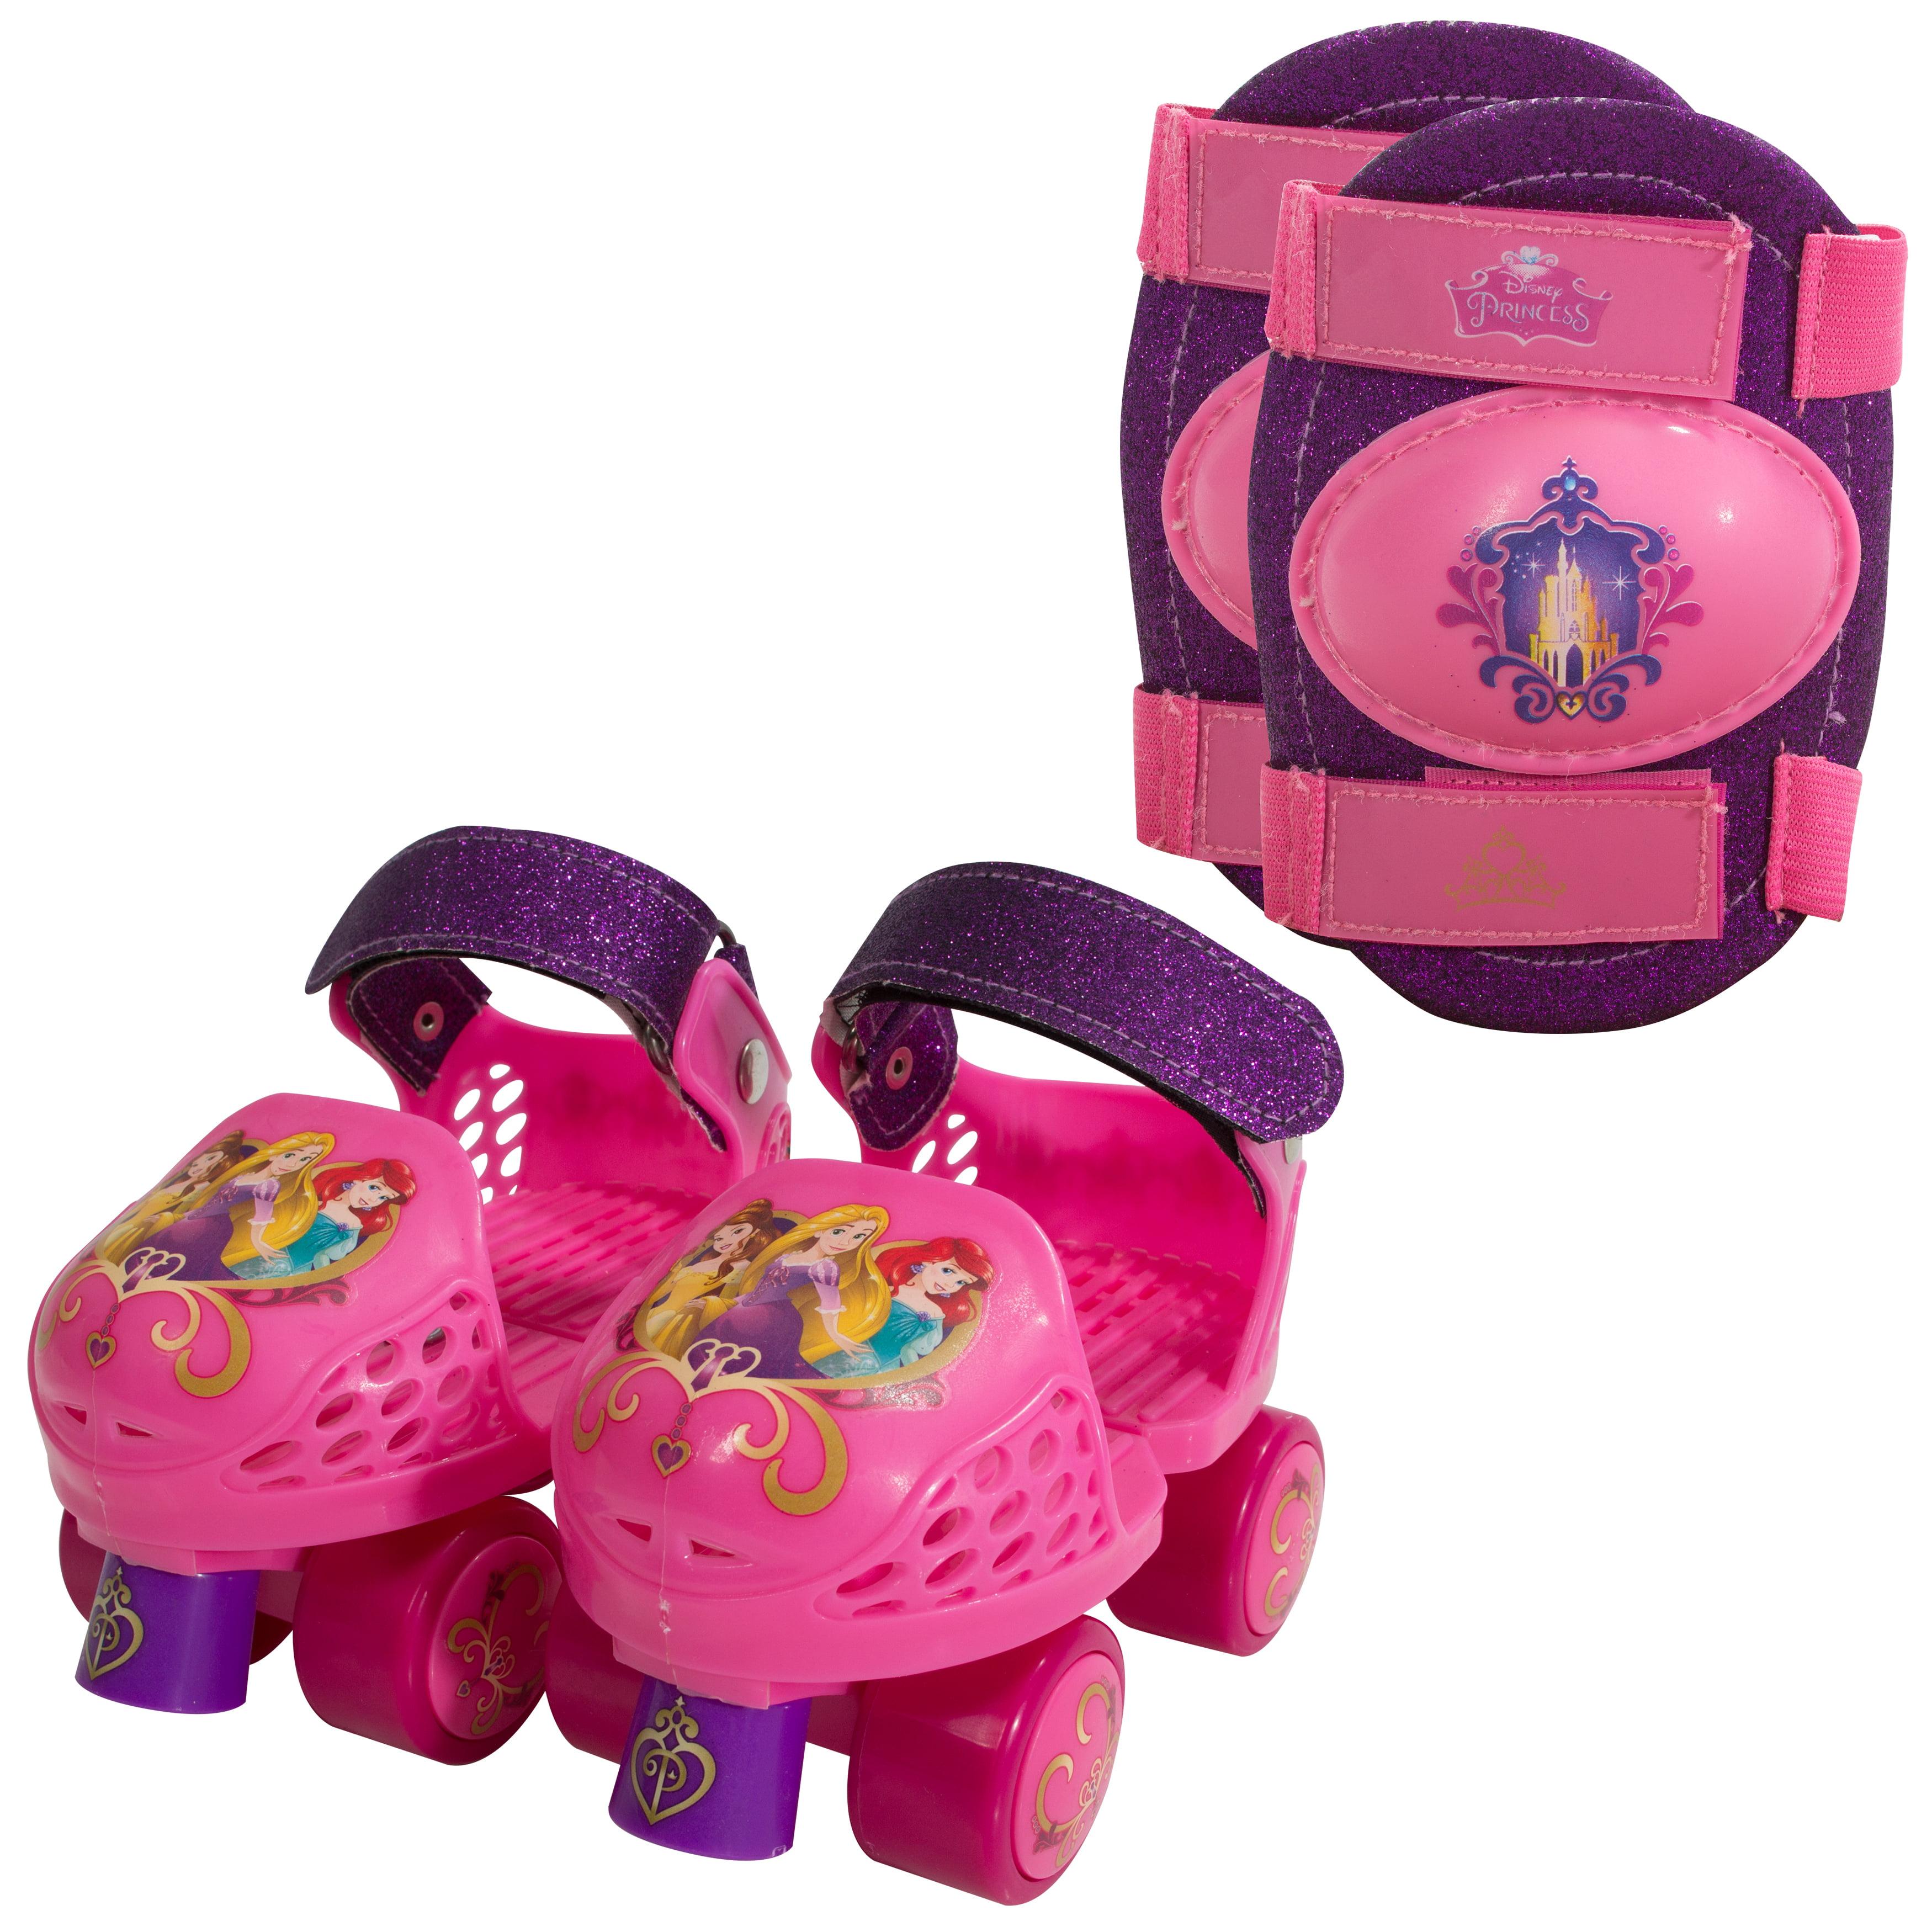 Chicago roller skates walmart - Disney Princess Kid S Rollerskates With Knee Pads